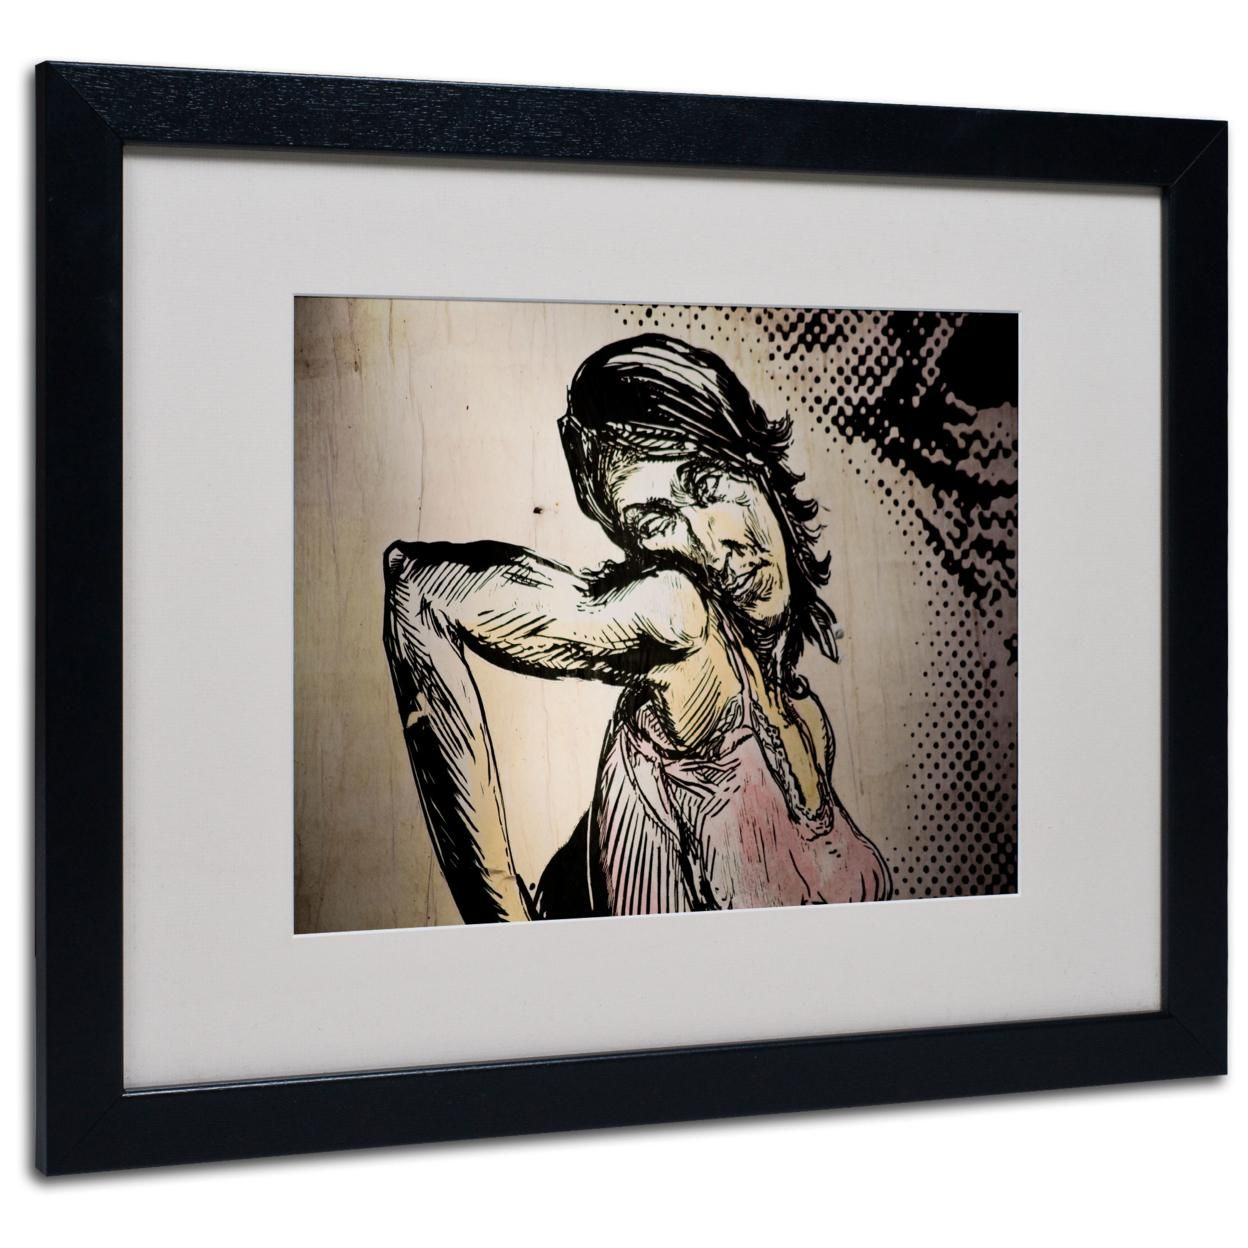 Yale Gurney 'Elbow Up Pop Art' Black Wooden Framed Art 18 x 22 Inches